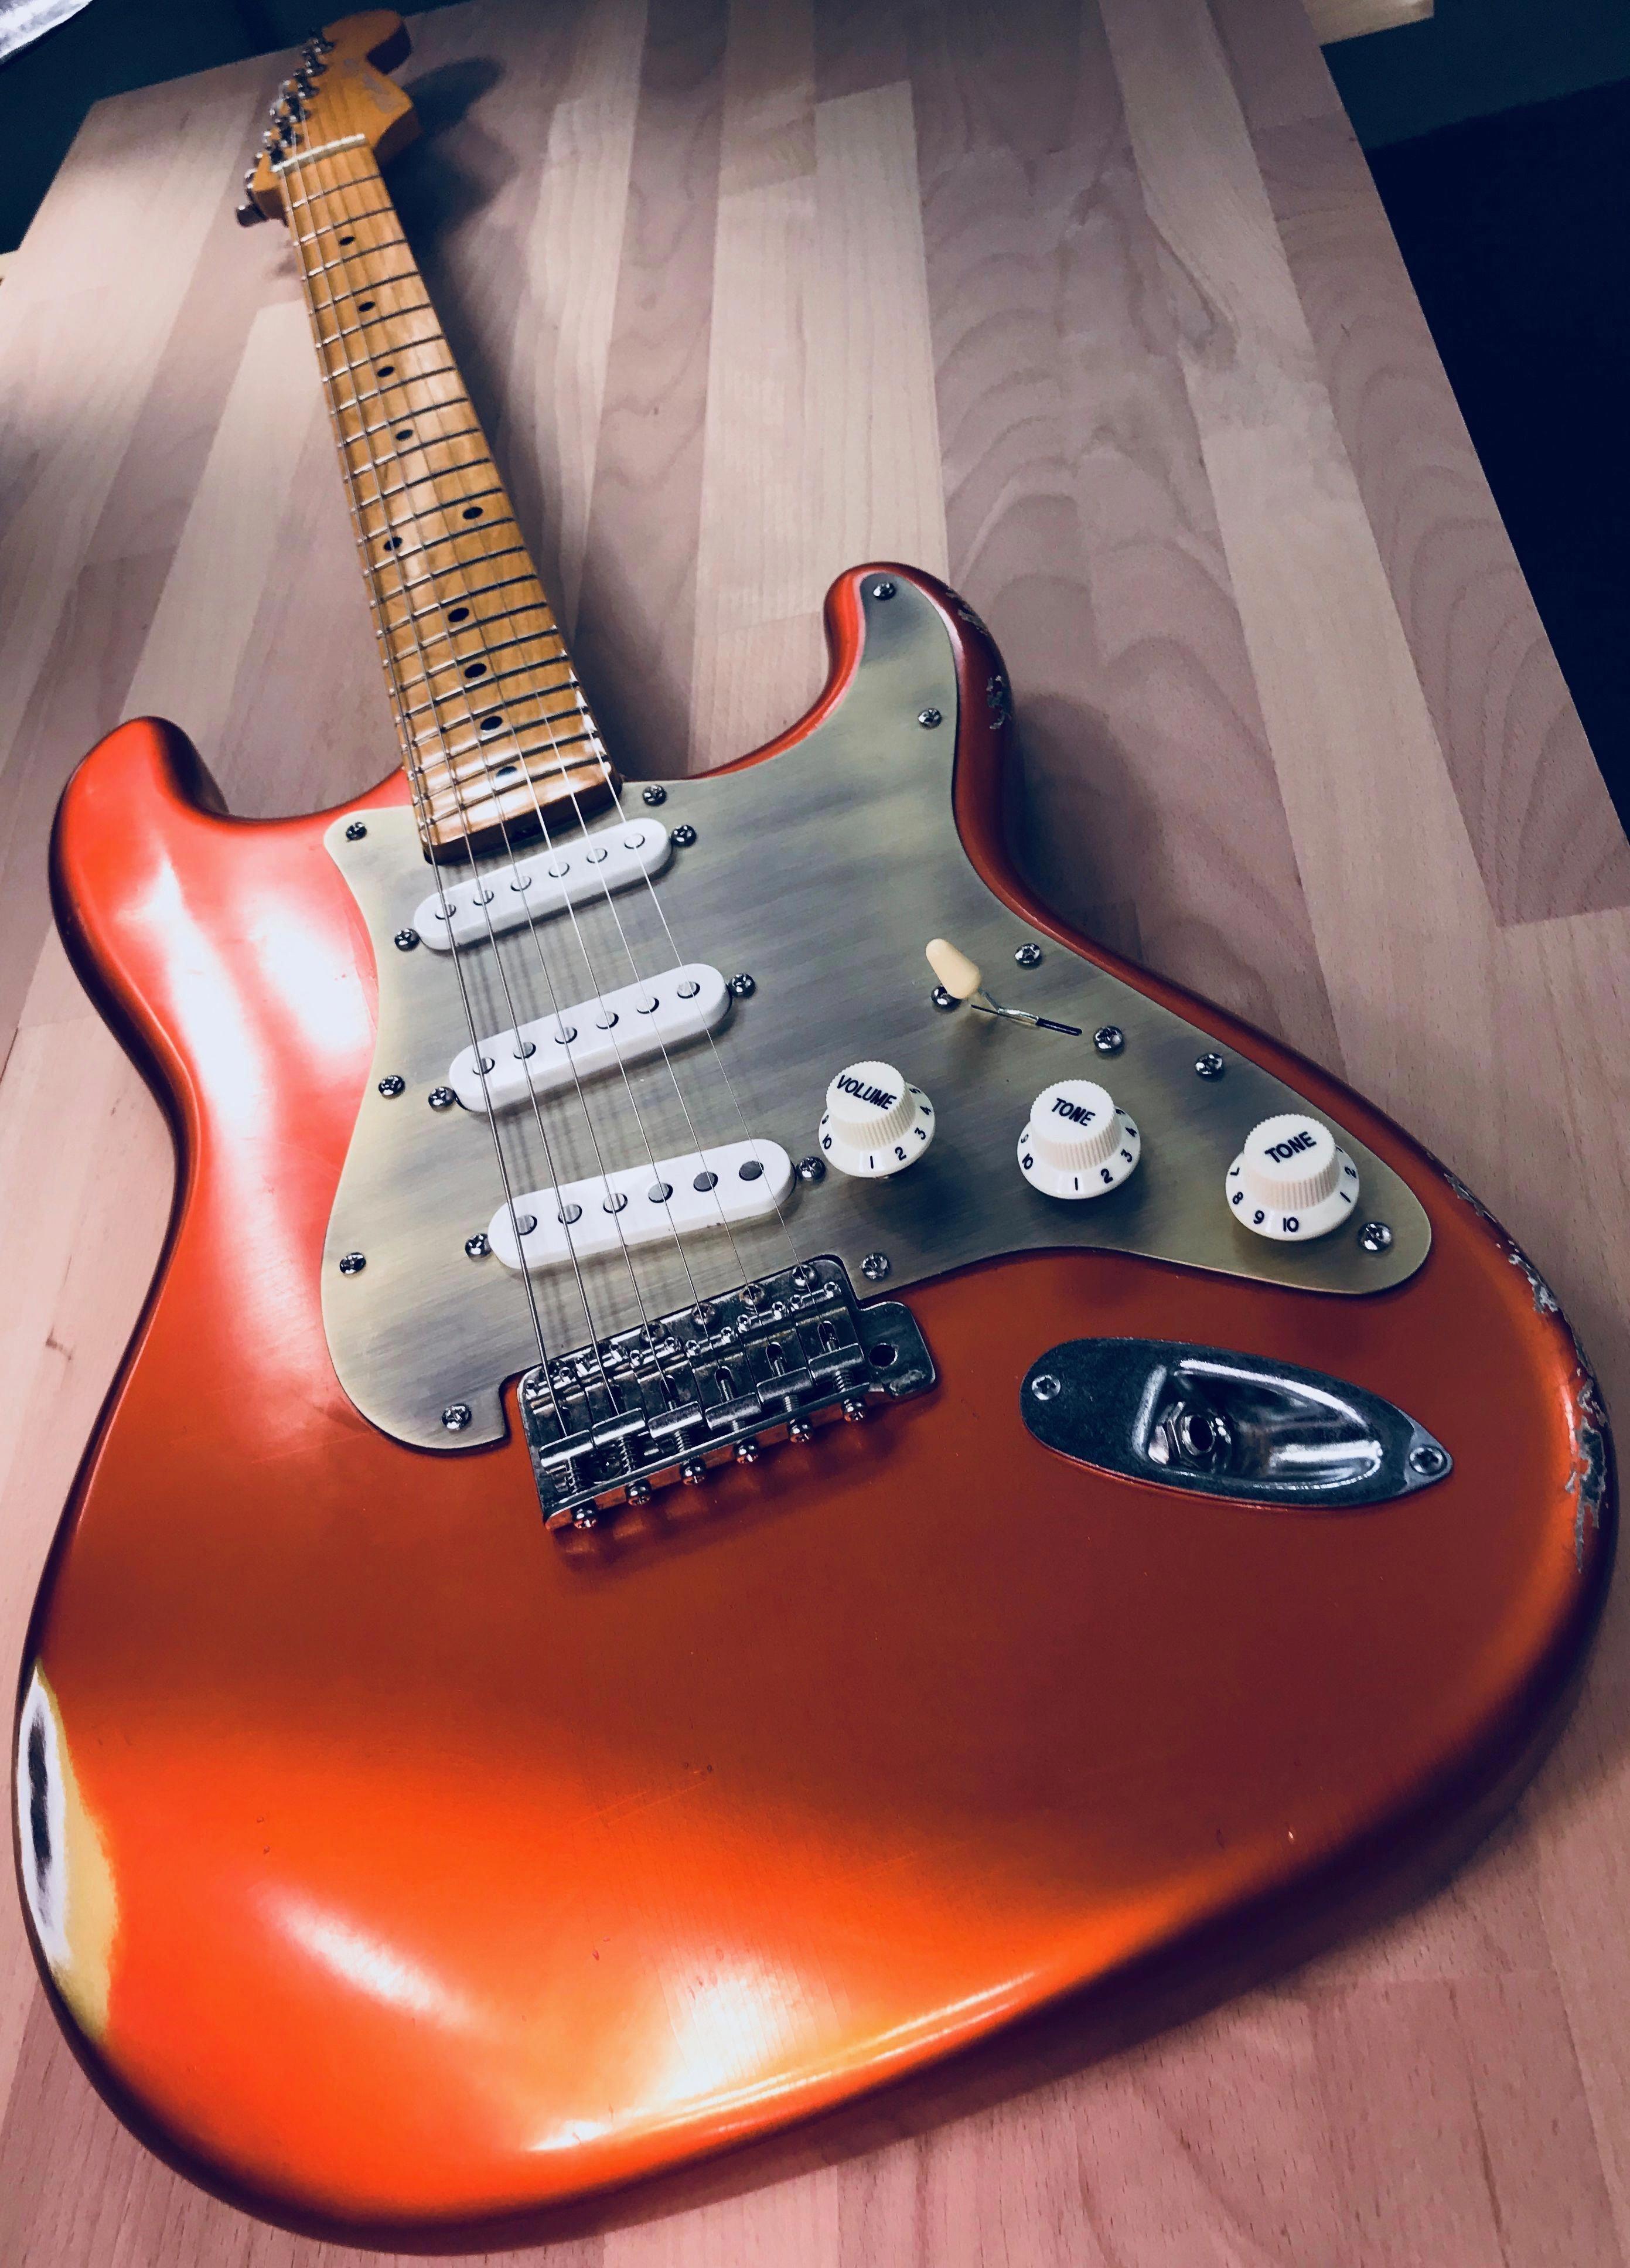 Vintage Guitars Which Is Really Great Fendertelecasterguitars Guitar Fender Guitars Stratocaster Fender Guitars